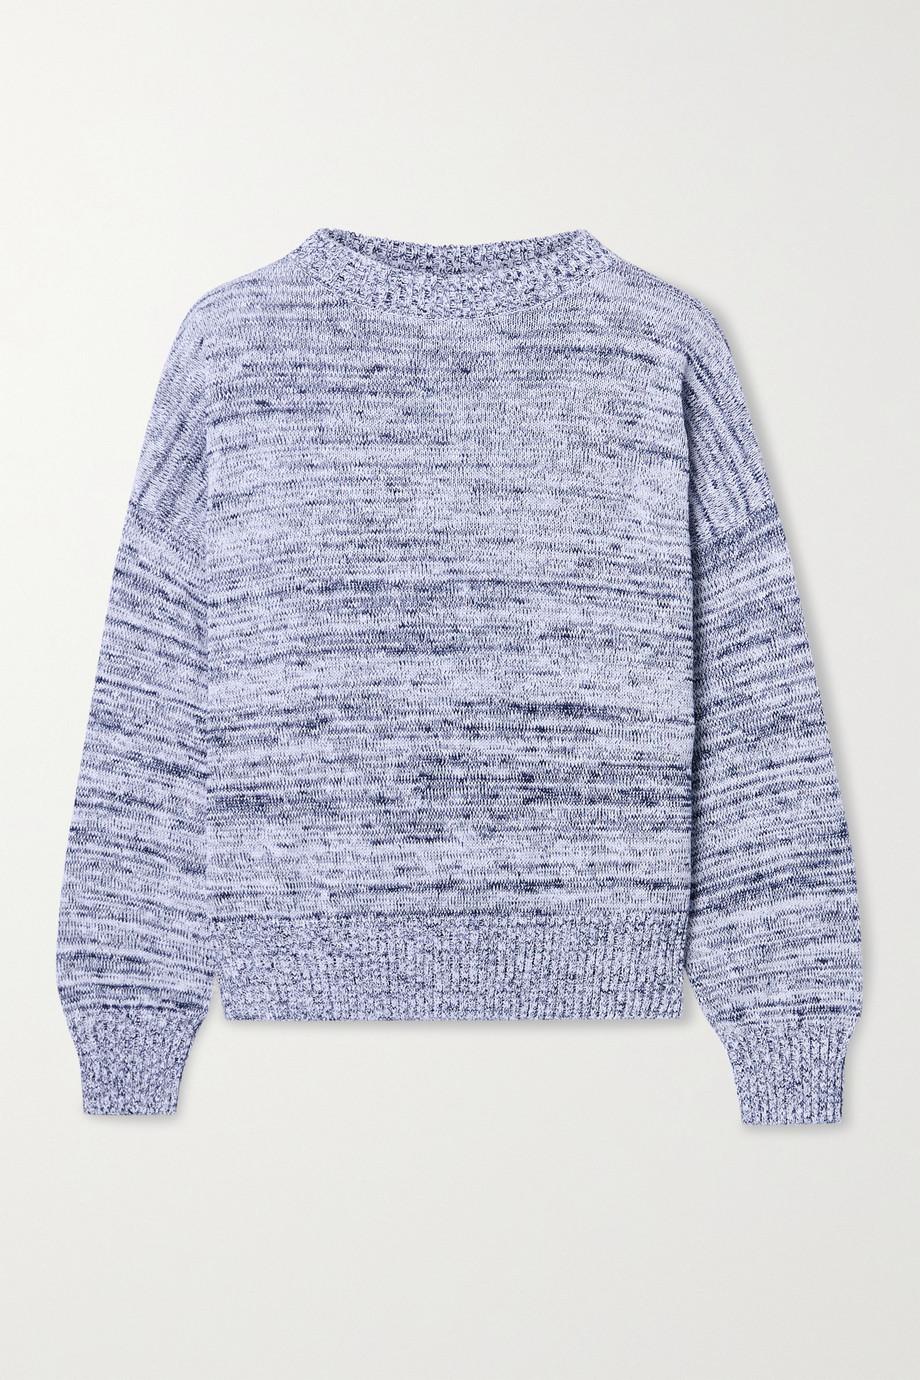 Max Mara + Leisure Hangar mélange cotton sweater